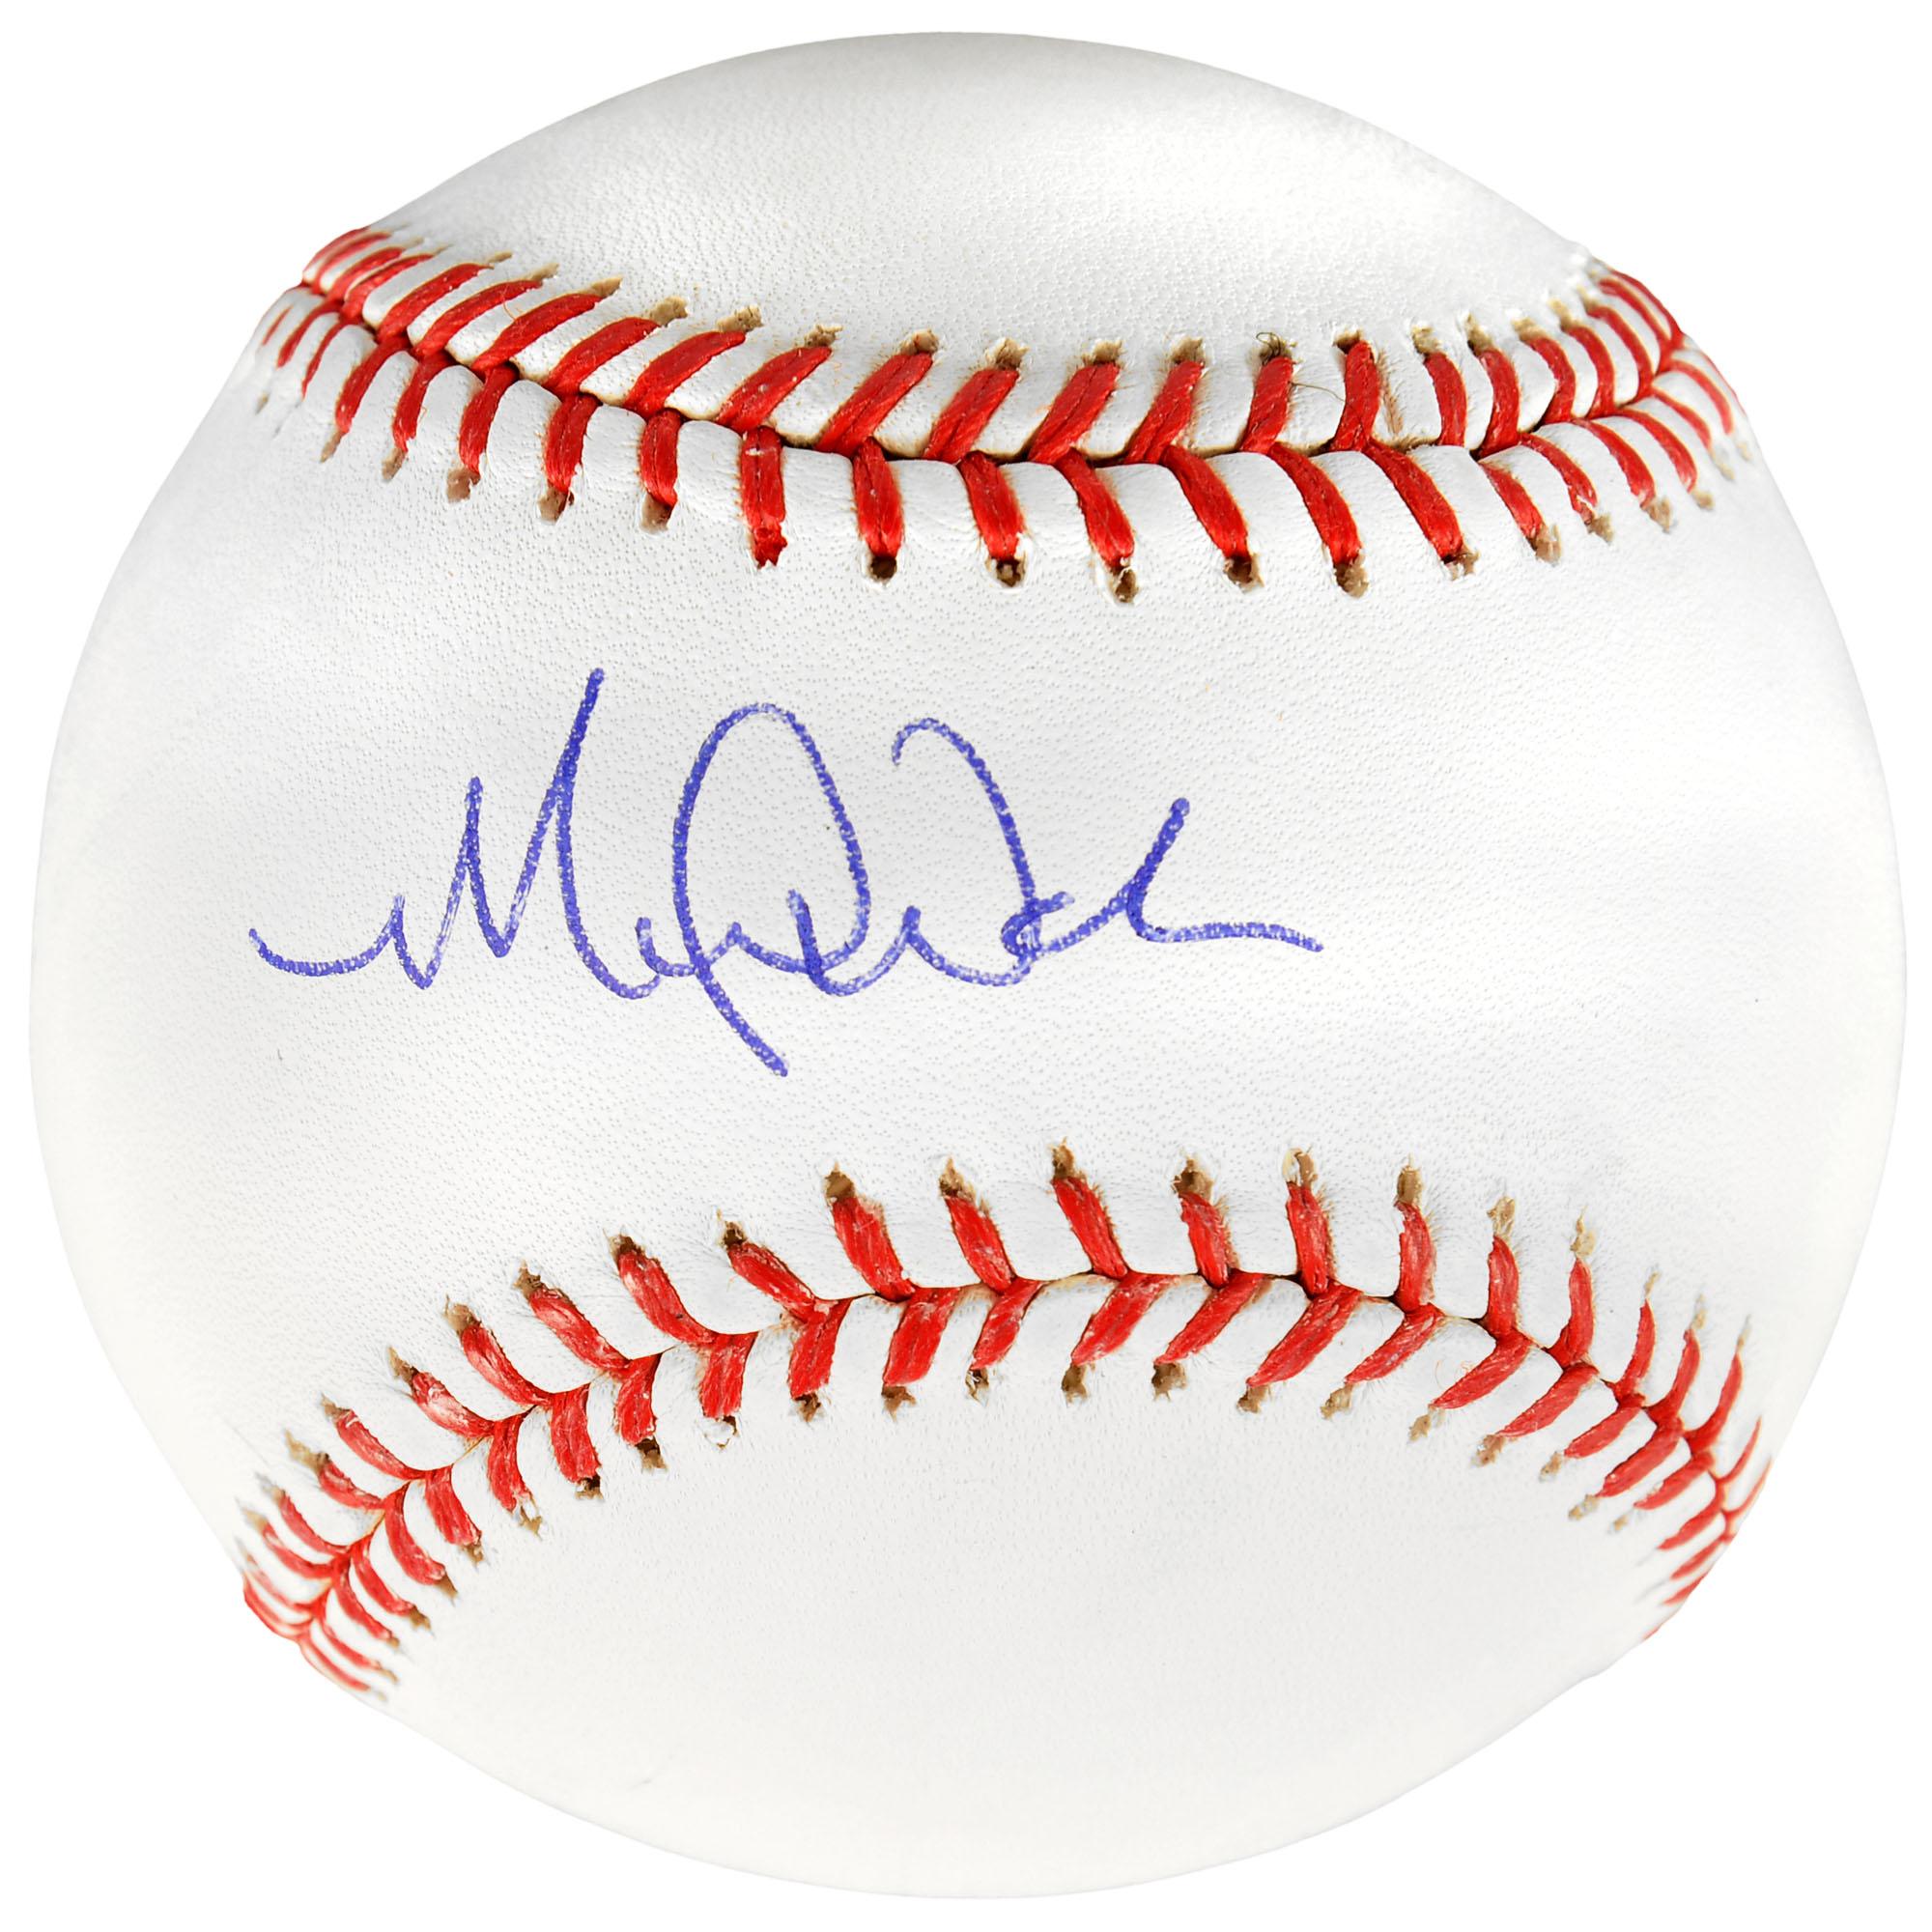 Michael Wacha St. Louis Cardinals Fanatics Authentic Autographed Baseball - No Size